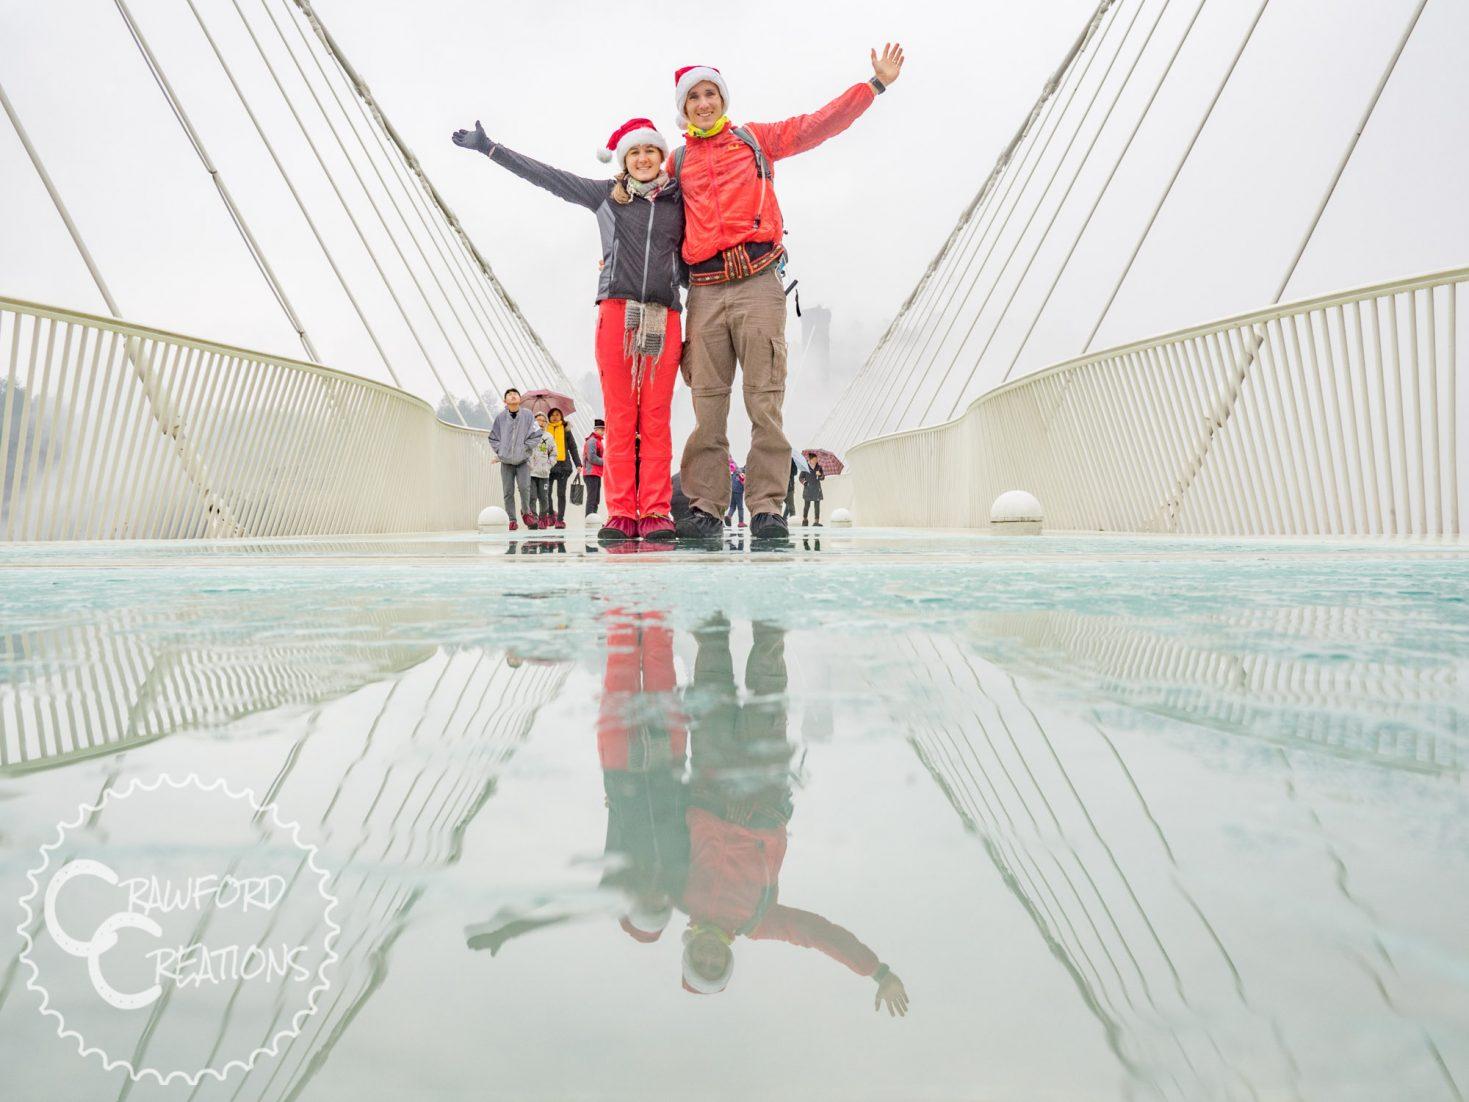 zhangjiajie-glass-bridge-portrait